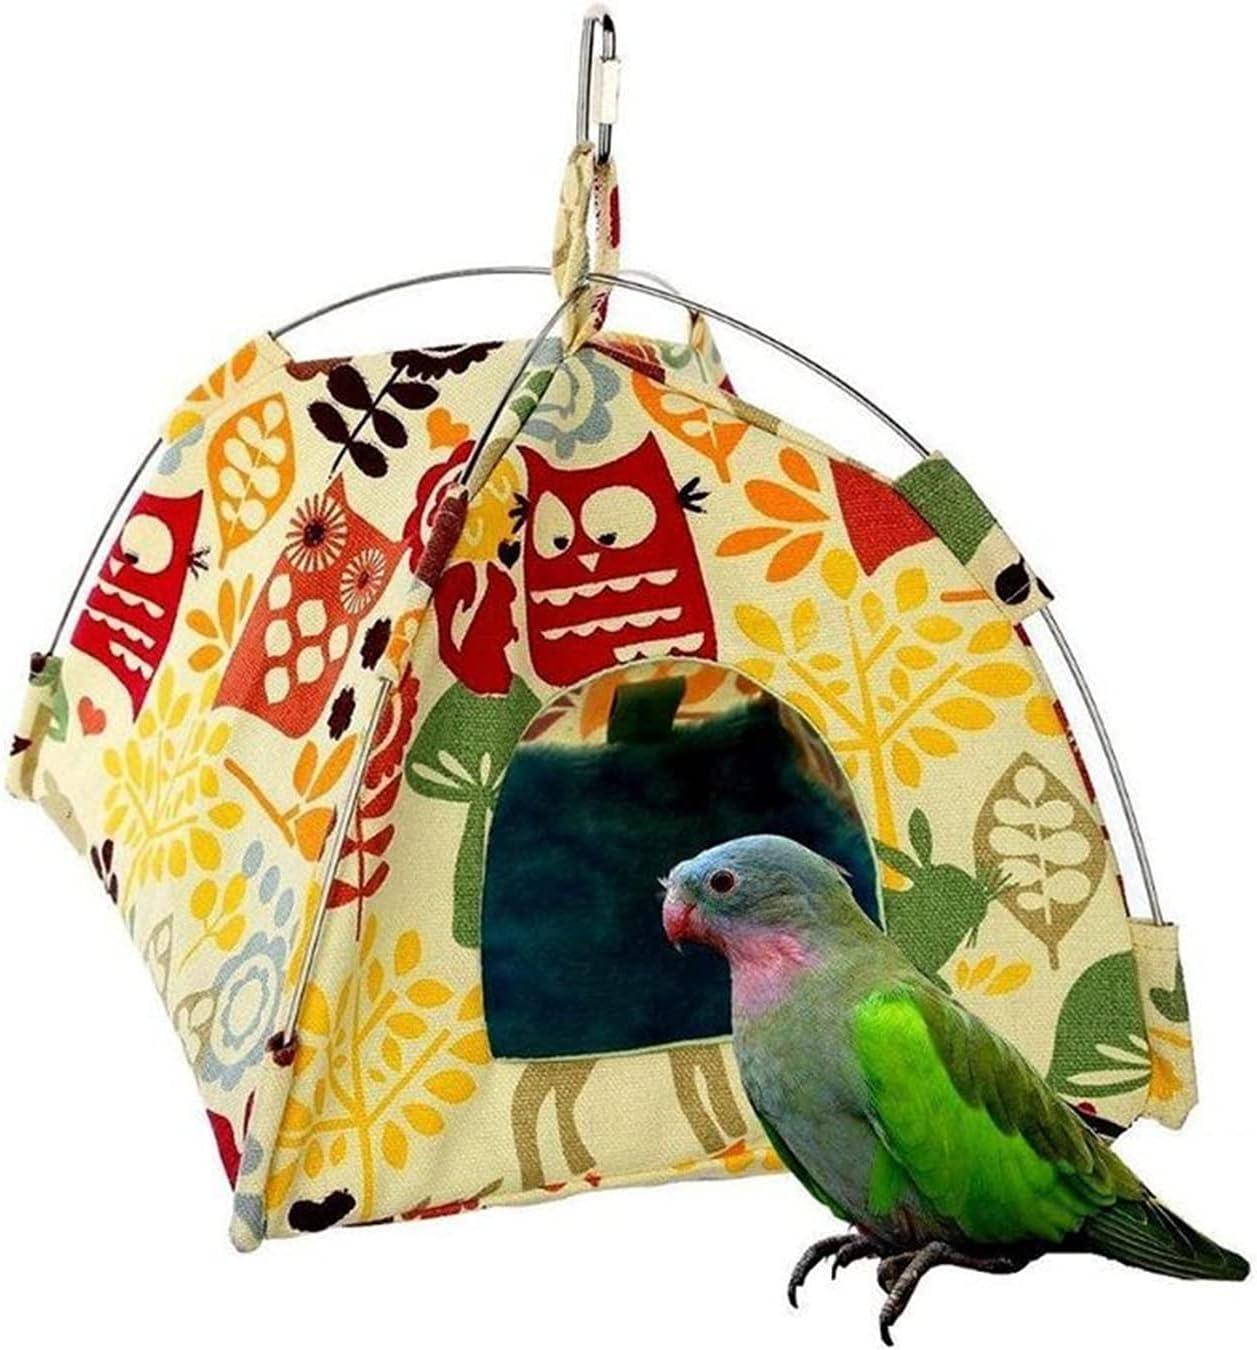 OMYLFQ Cat Hammock Bed Bird Nest Popular brand latest in the world Cave Habitat Parrot House H